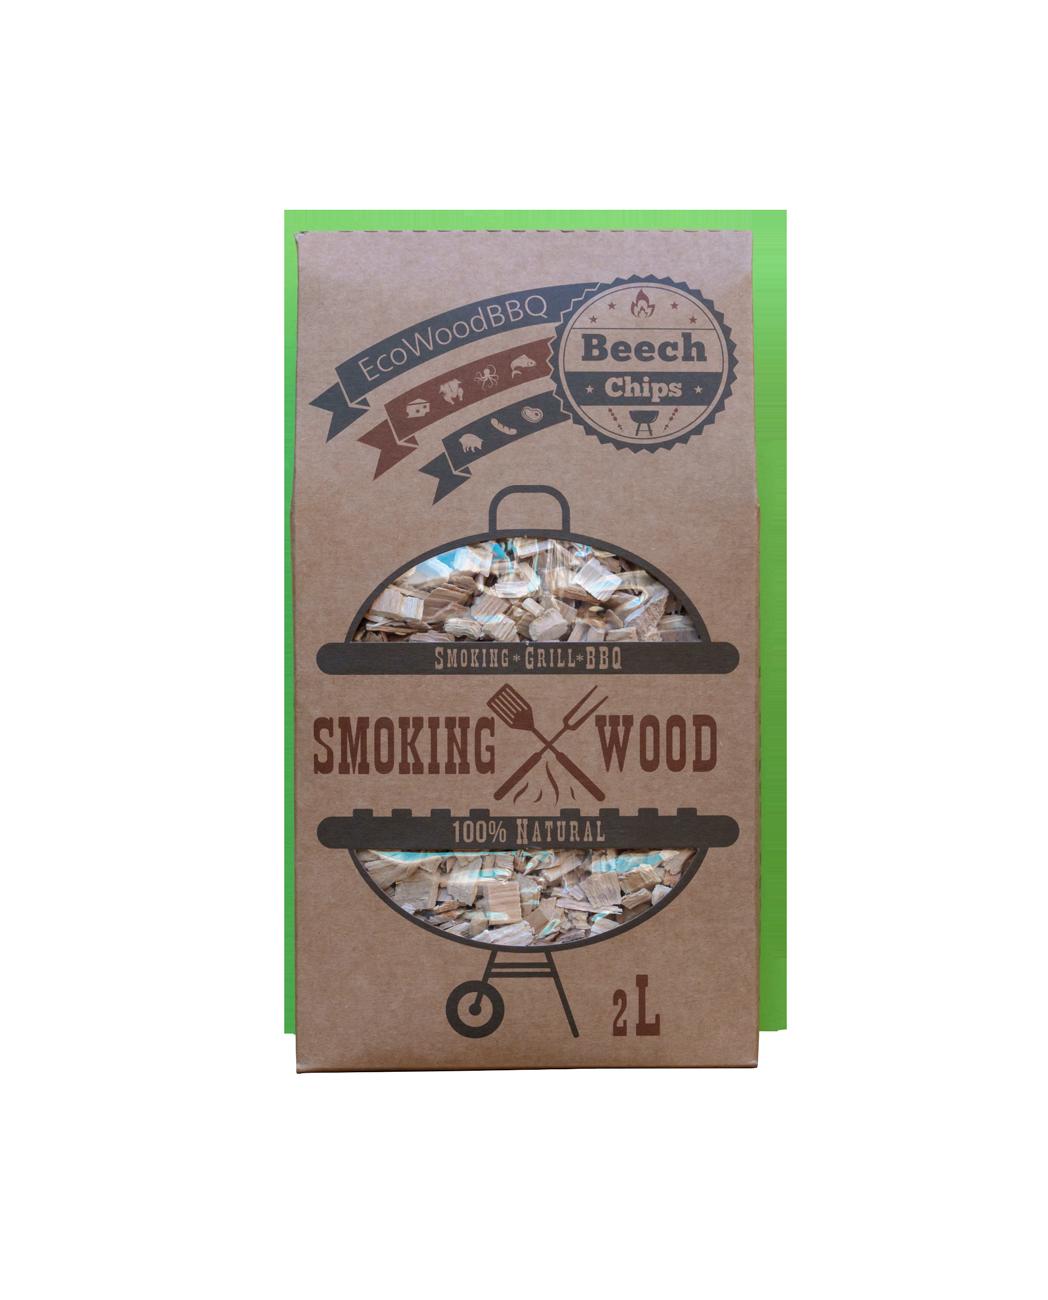 Beech Wood Chips EcoWoodBBQ | Rookplankje.nl